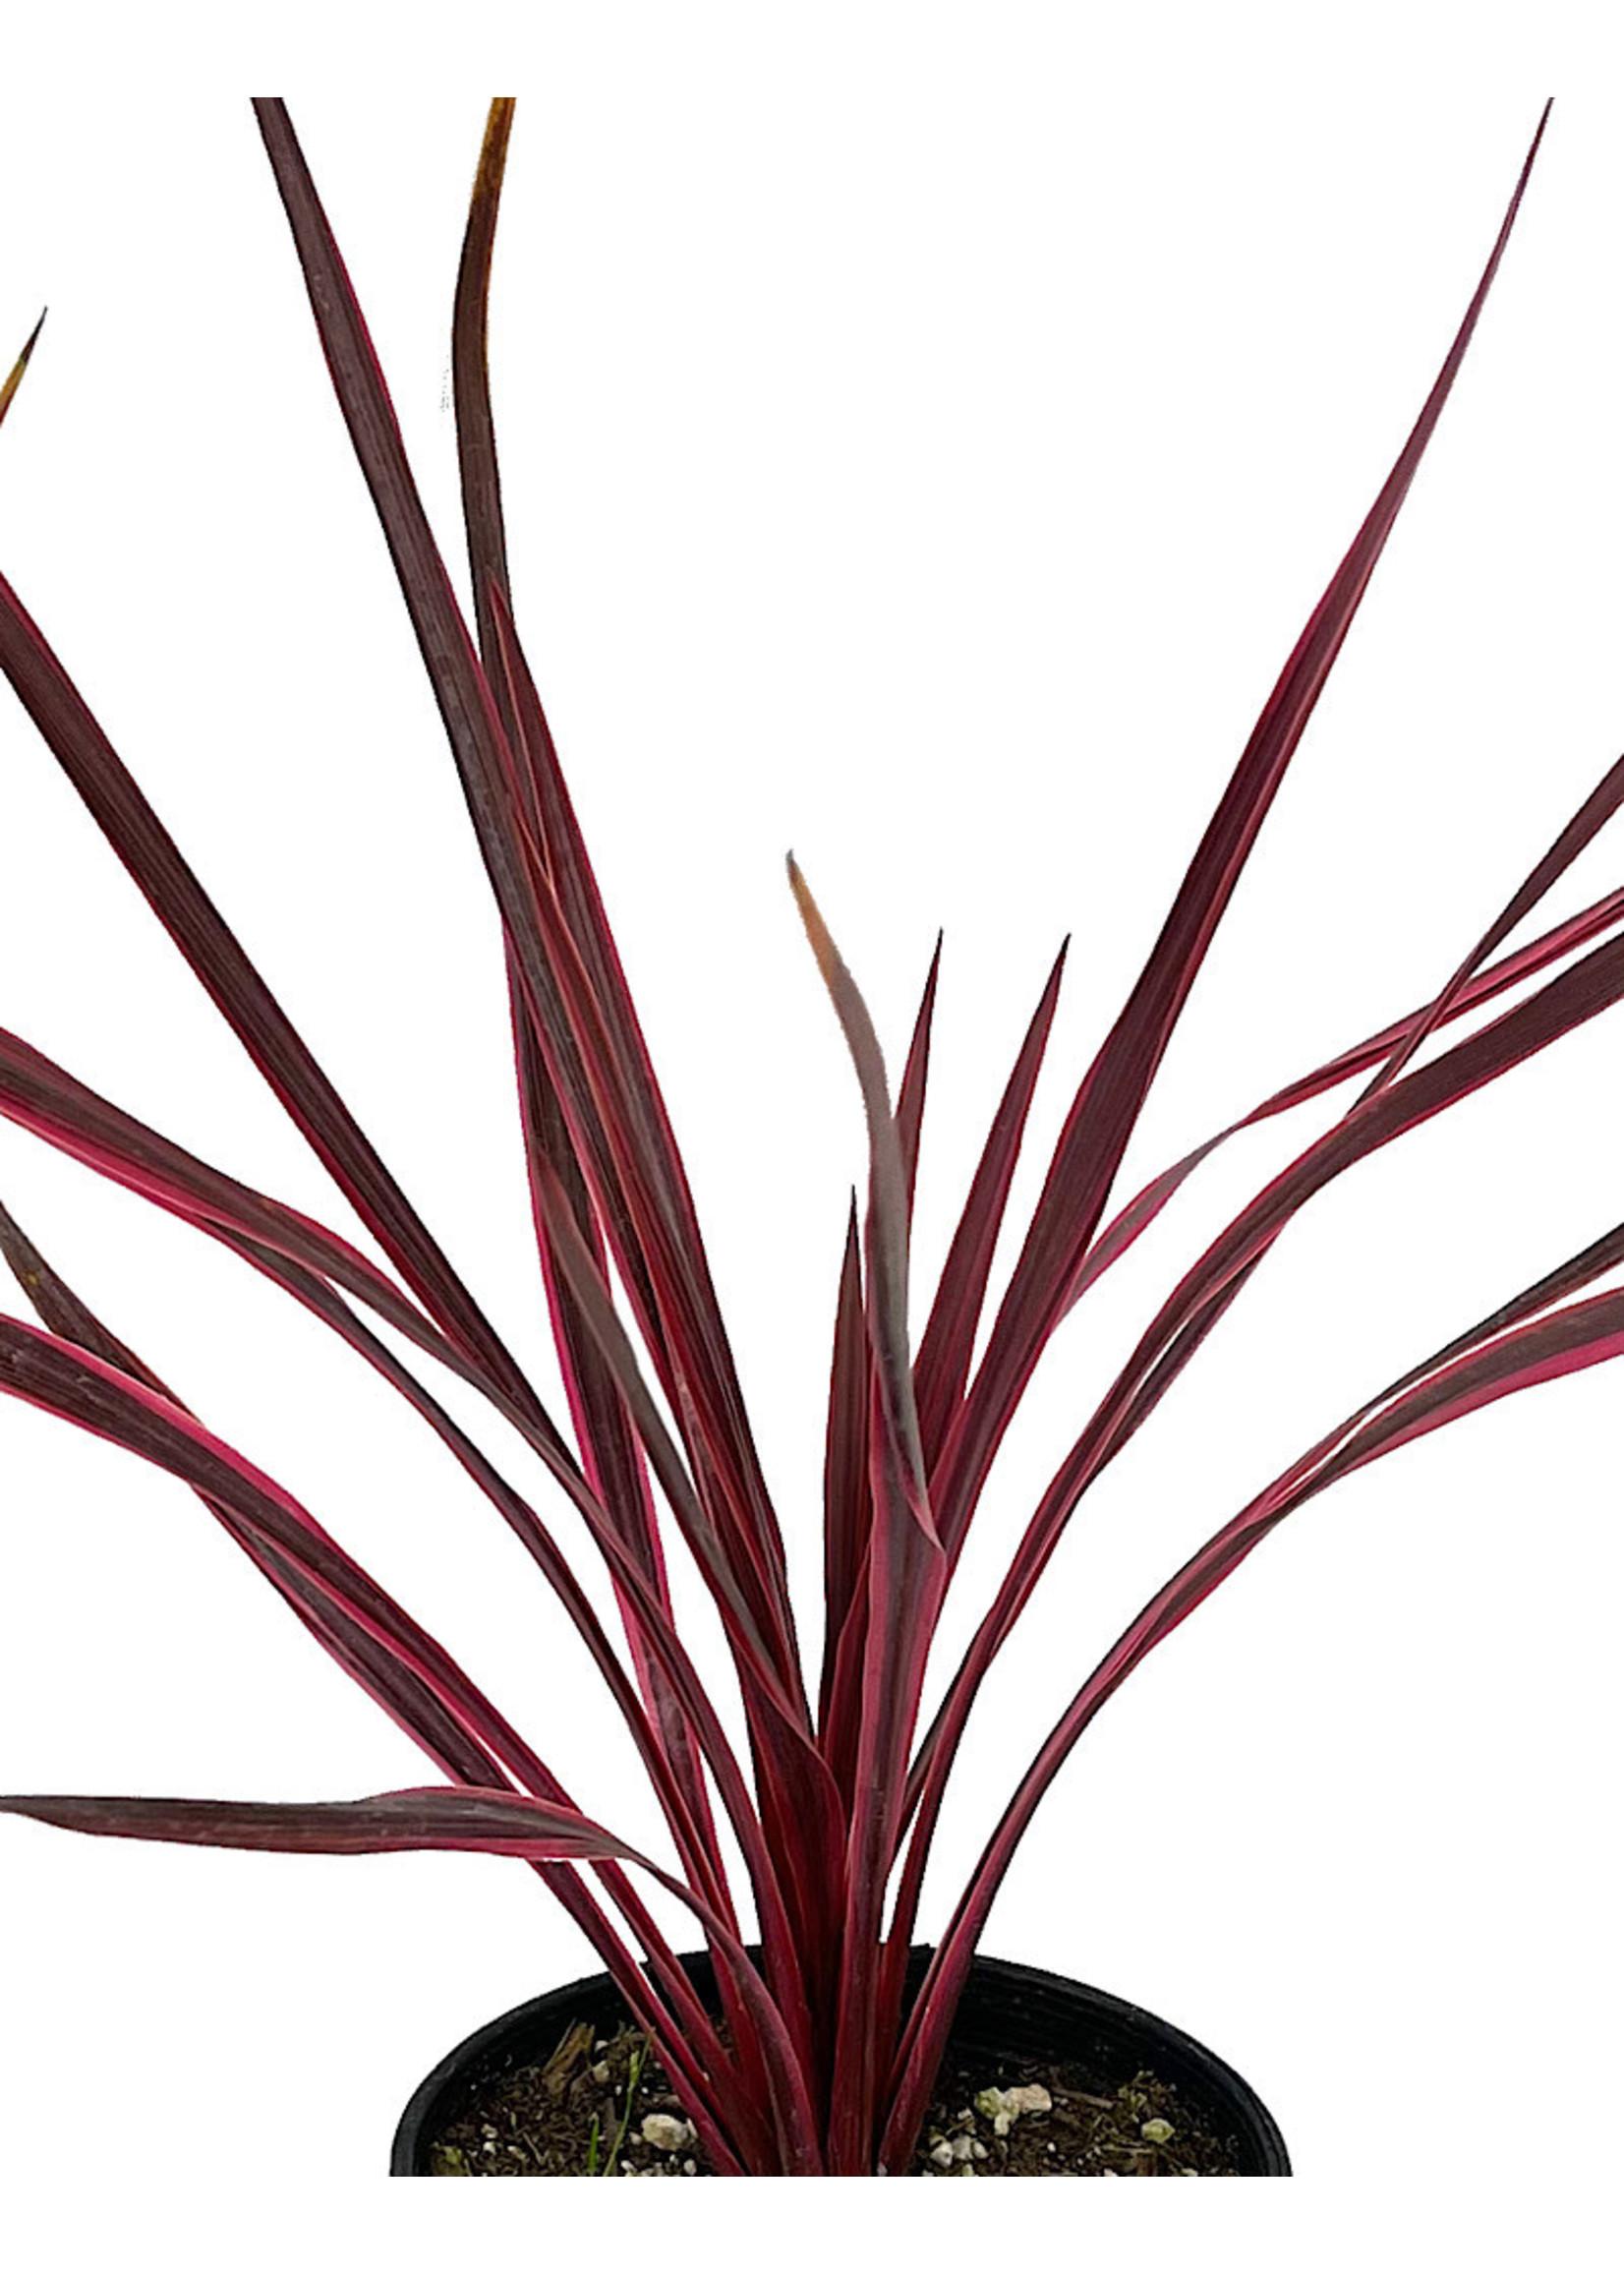 Cordyline a. 'Cherry Sensation' 1 Gallon